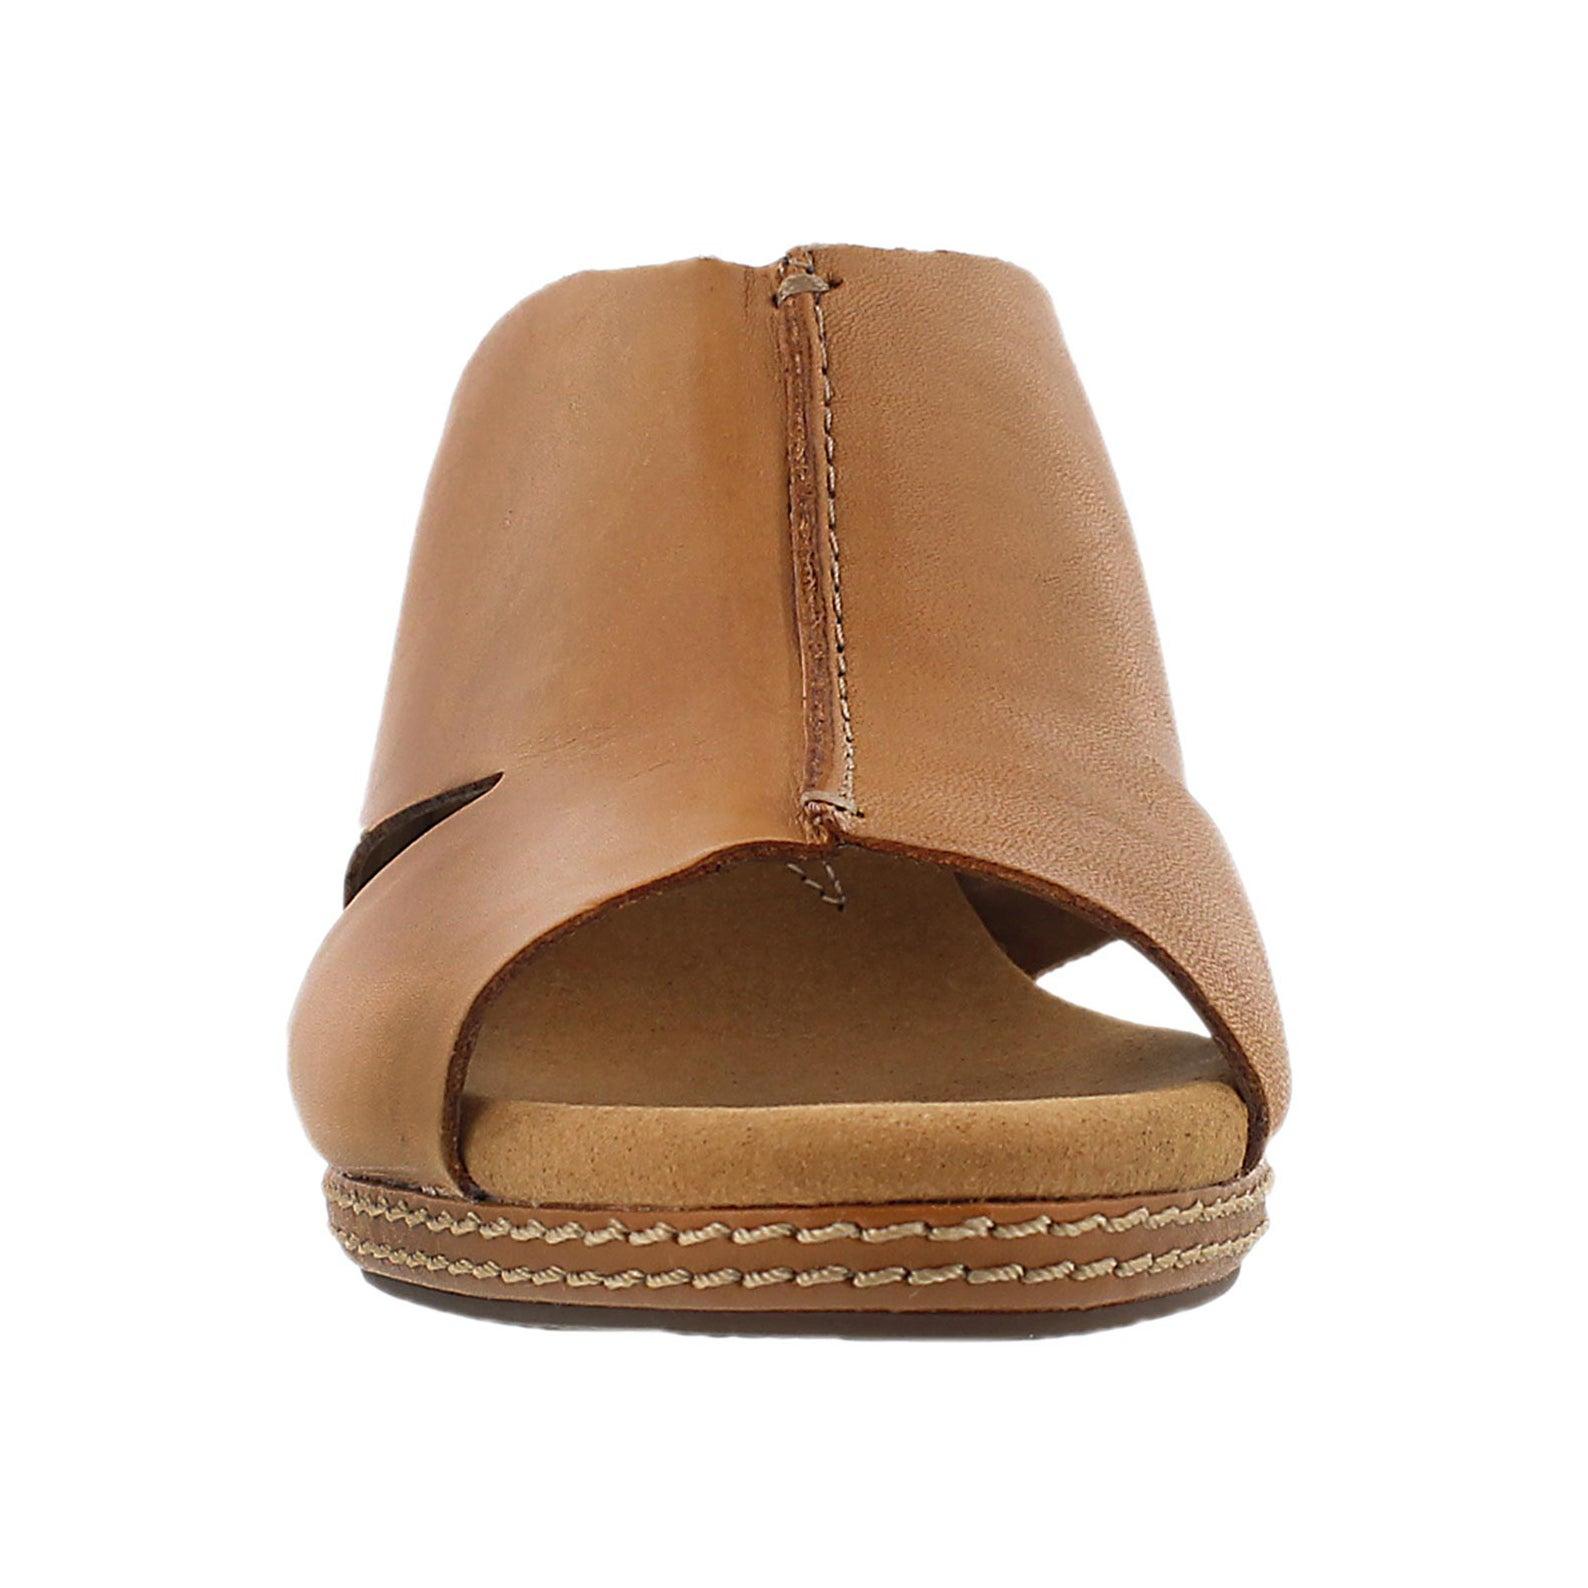 Lds Helio Island tan slide wedge sandal